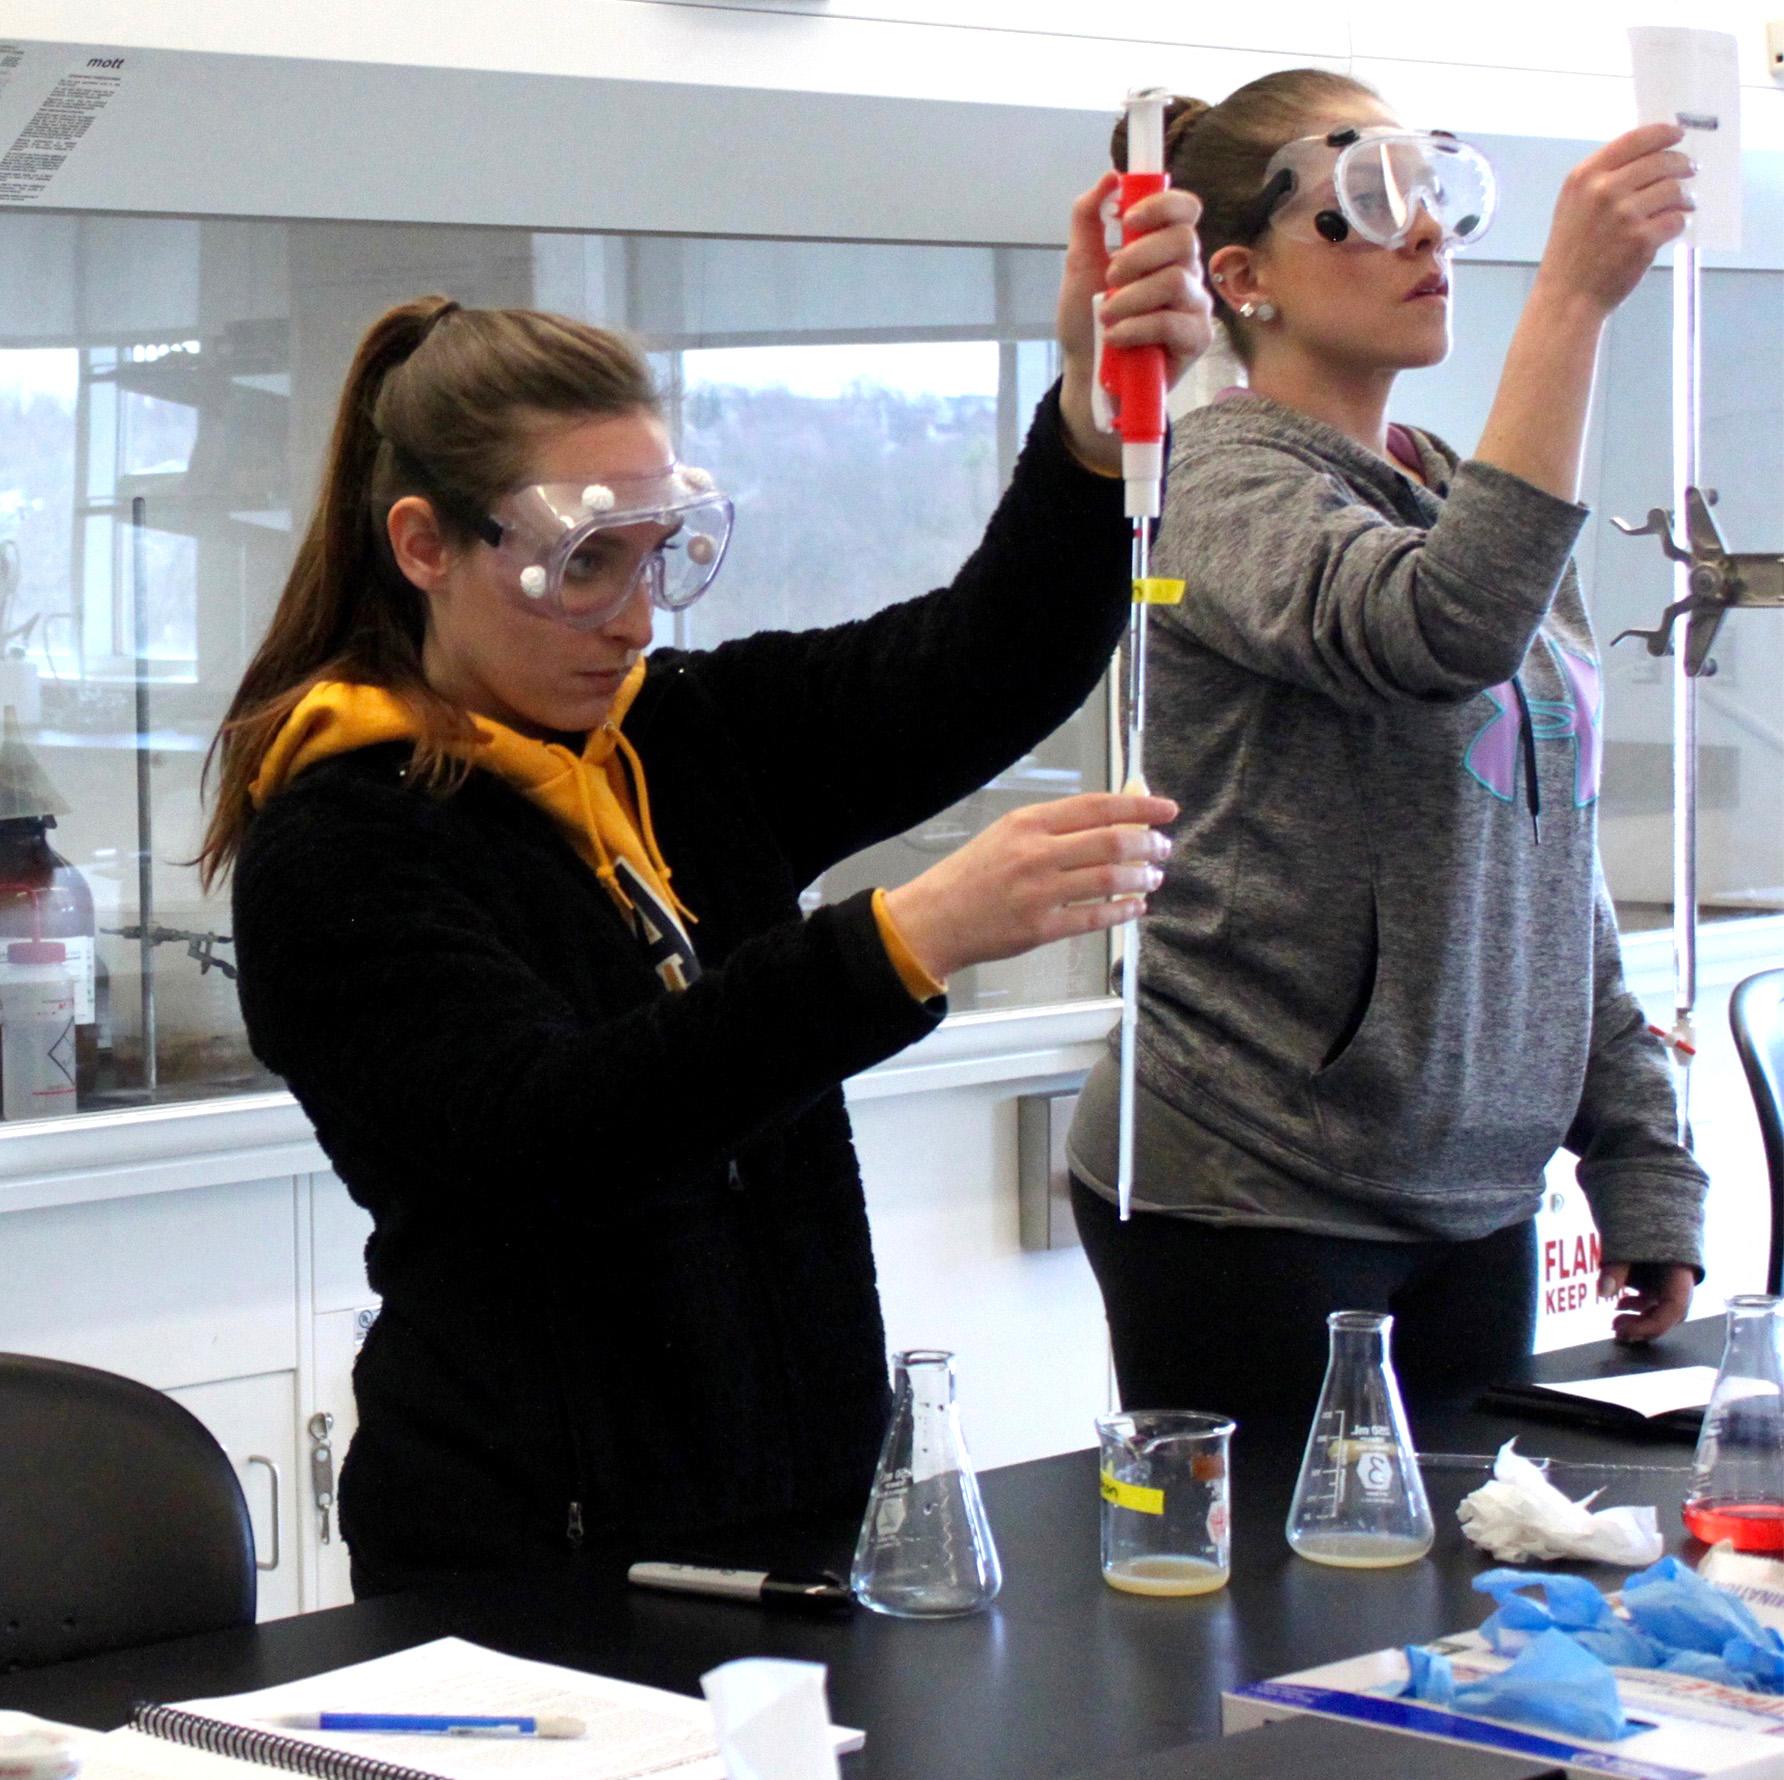 Clarke University Biochemistry students working in lab.